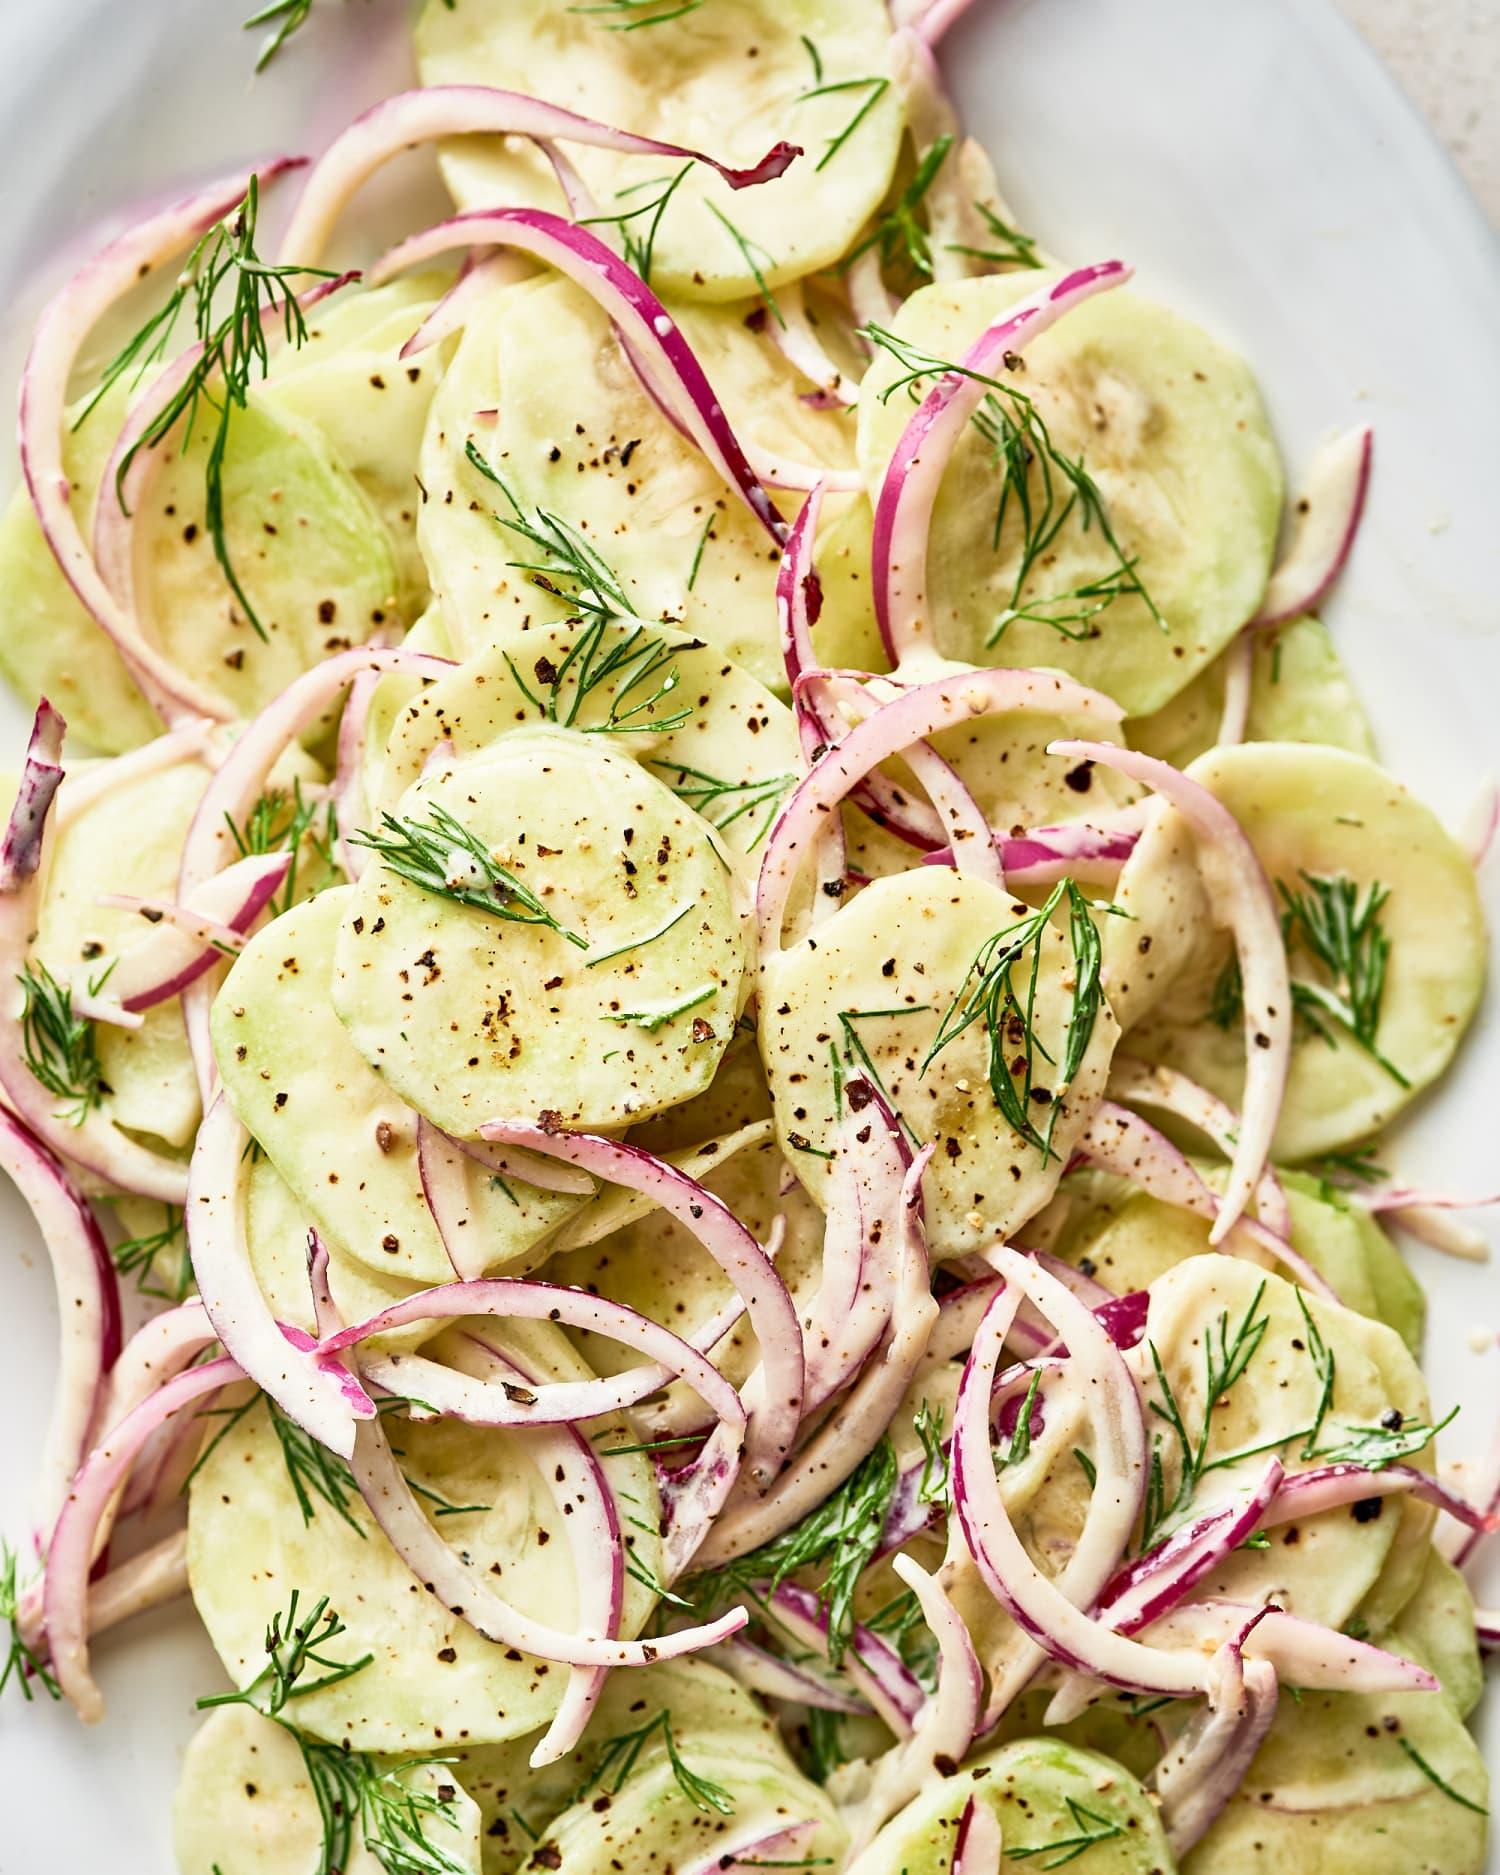 Recipe: Sour Cream and Dill Cucumber Salad